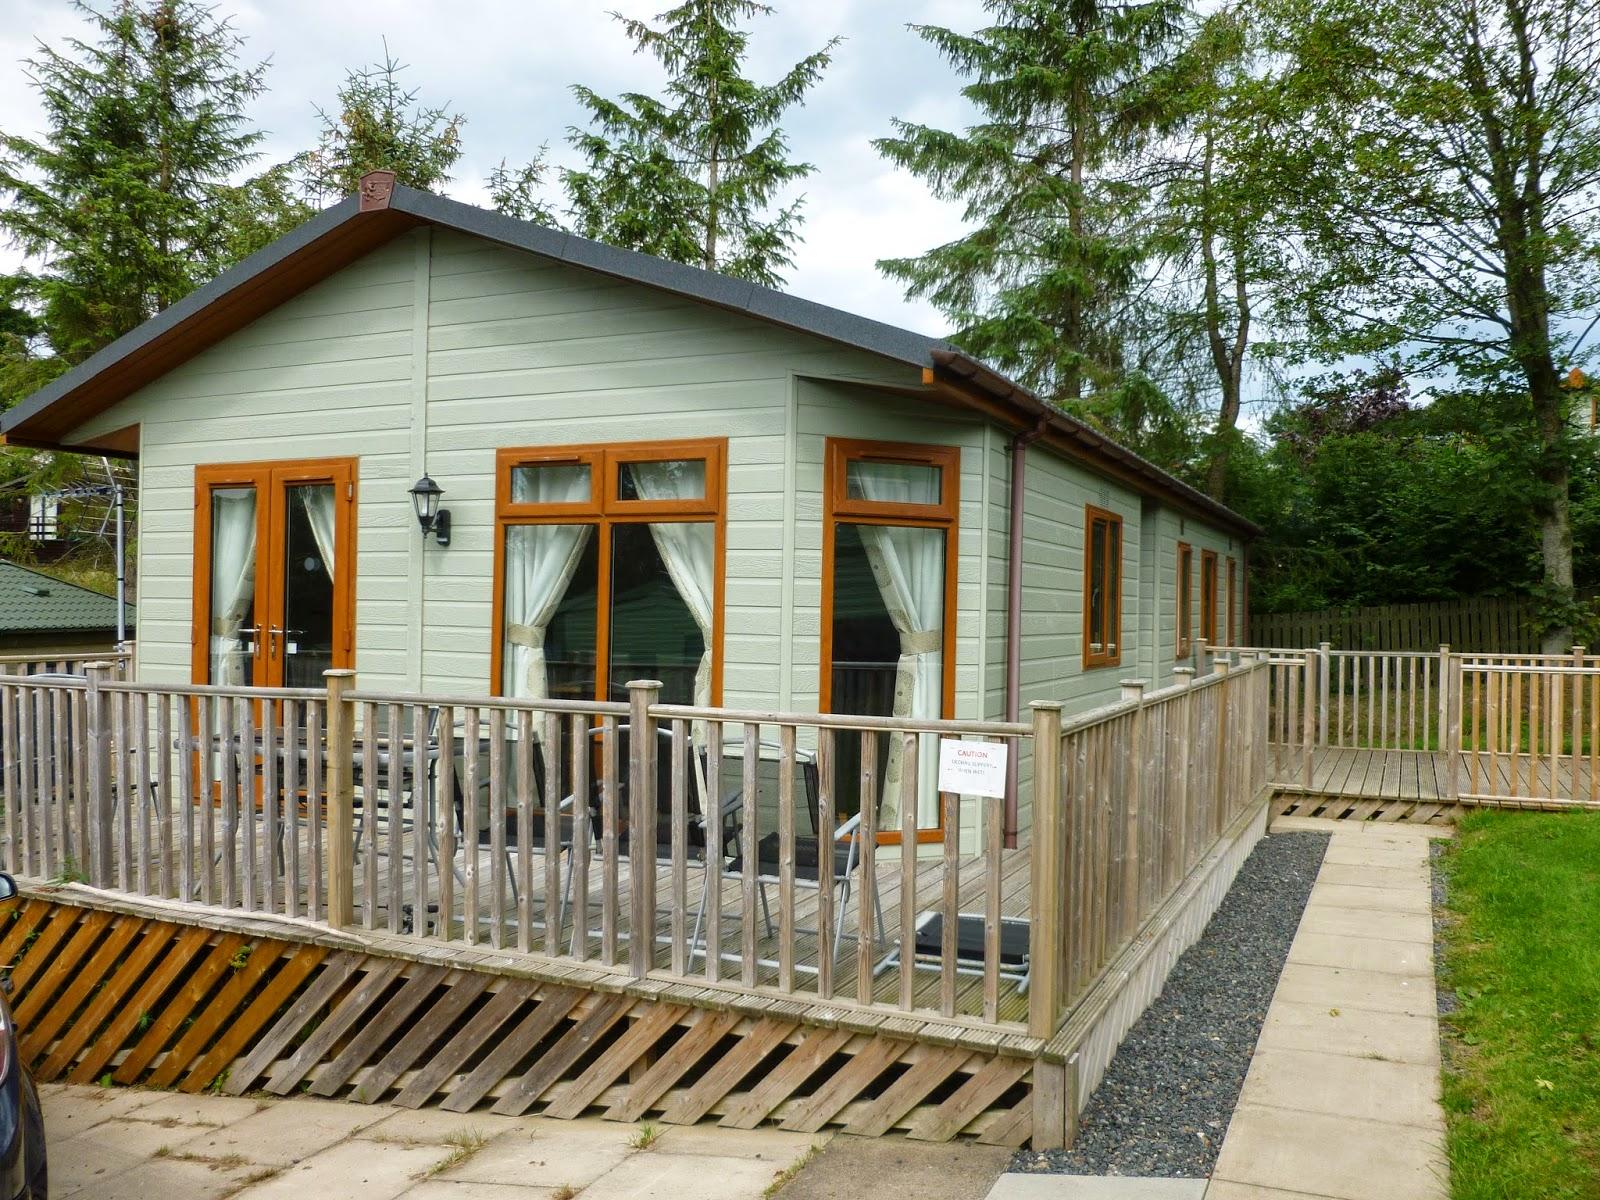 Pooley Bridge Lodge